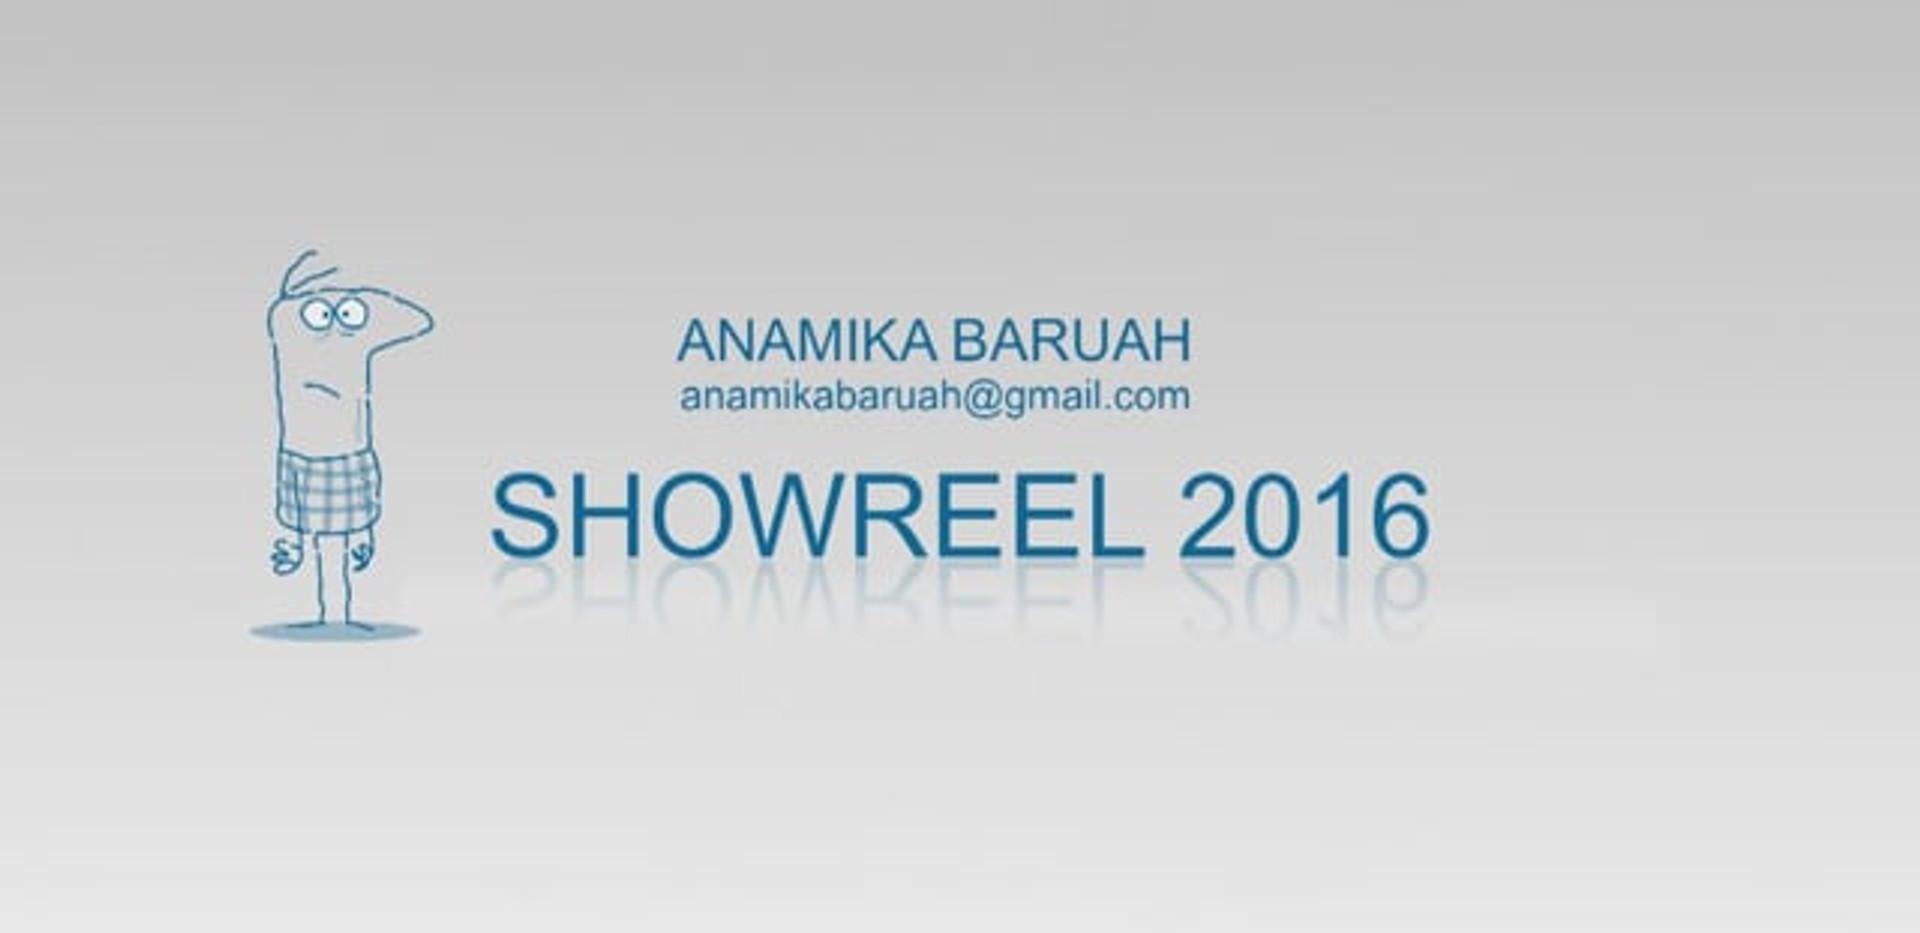 Anamika Baruah's Animation Reel 2016